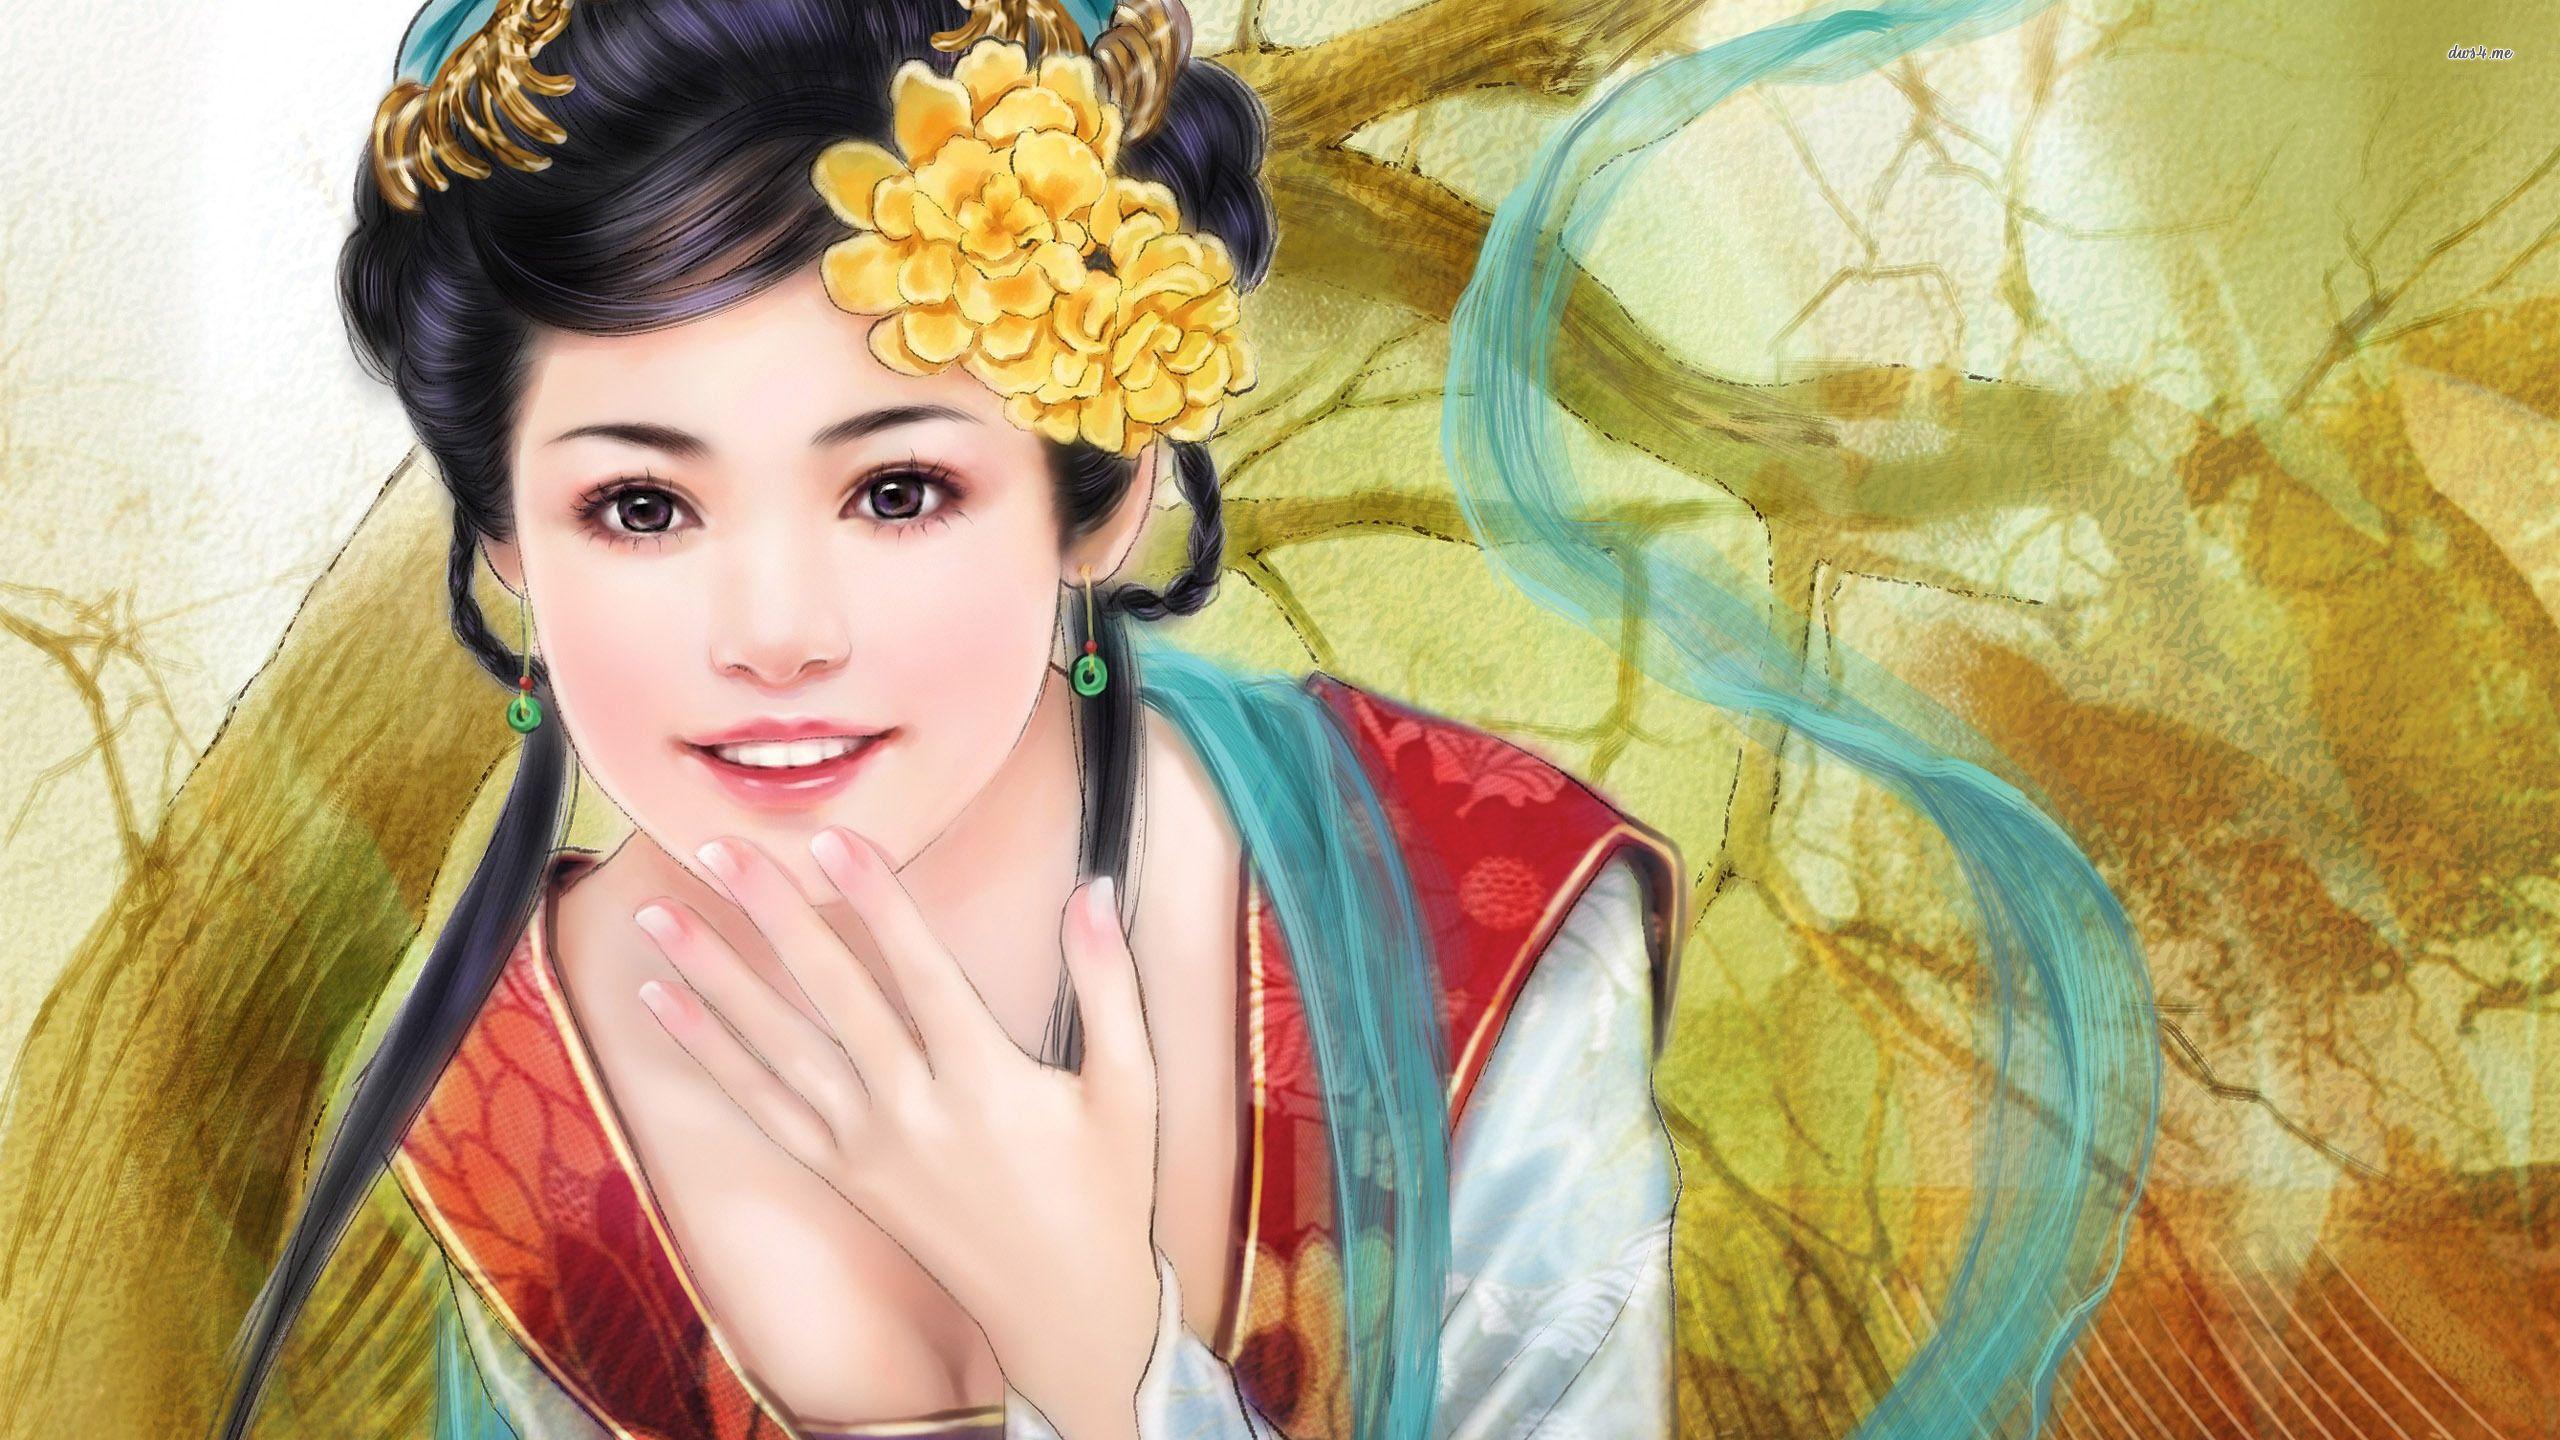 Cute Asian Girl Wallpapers Full HD Free